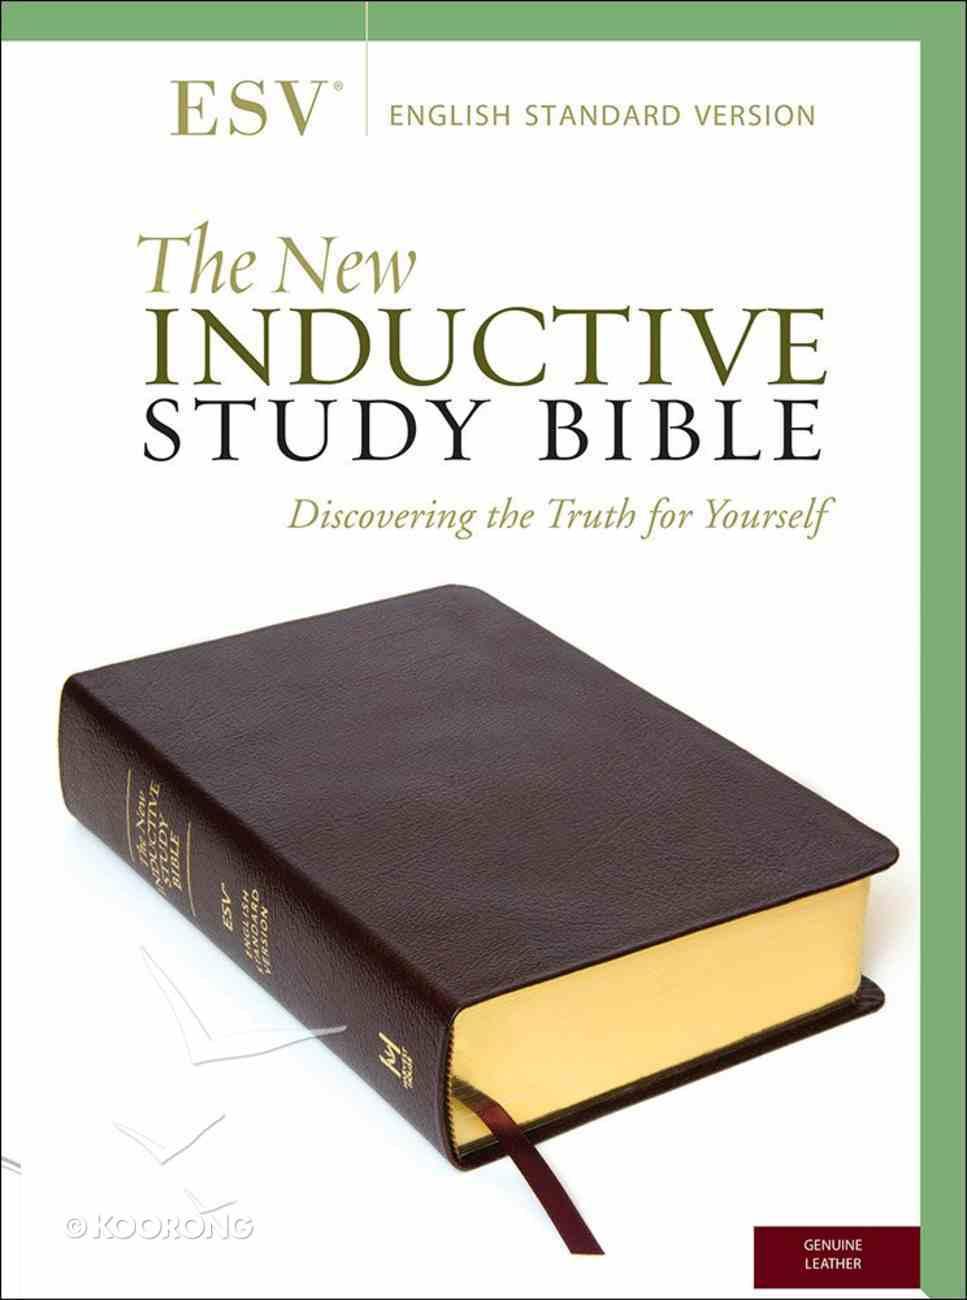 ESV New Inductive Study Bible Burgundy Genuine Leather